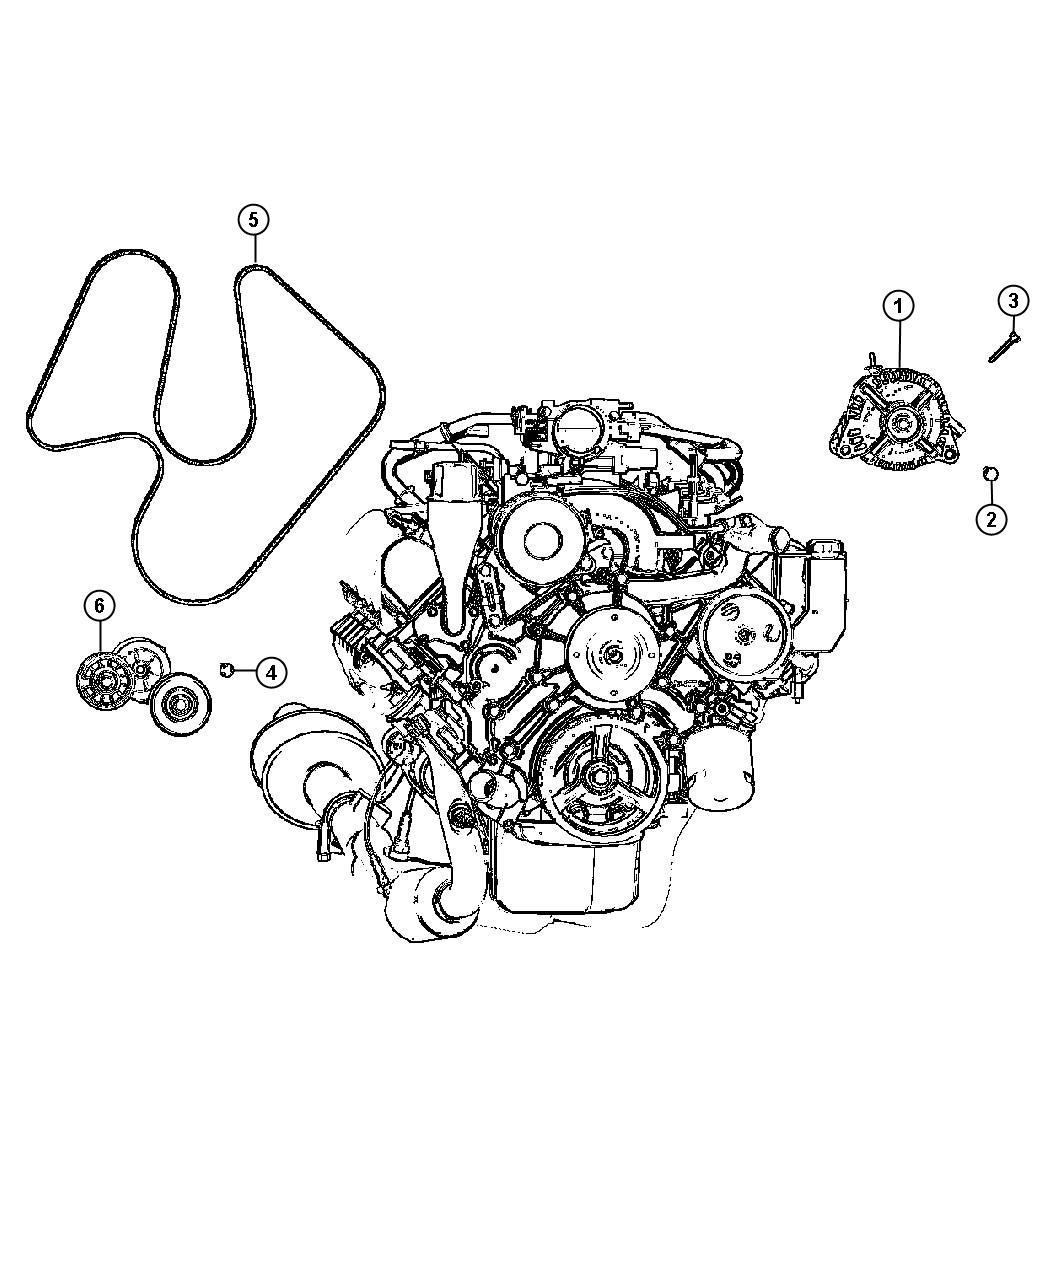 Dodge Dakota Generator Remanufactured Engine 136 Amp